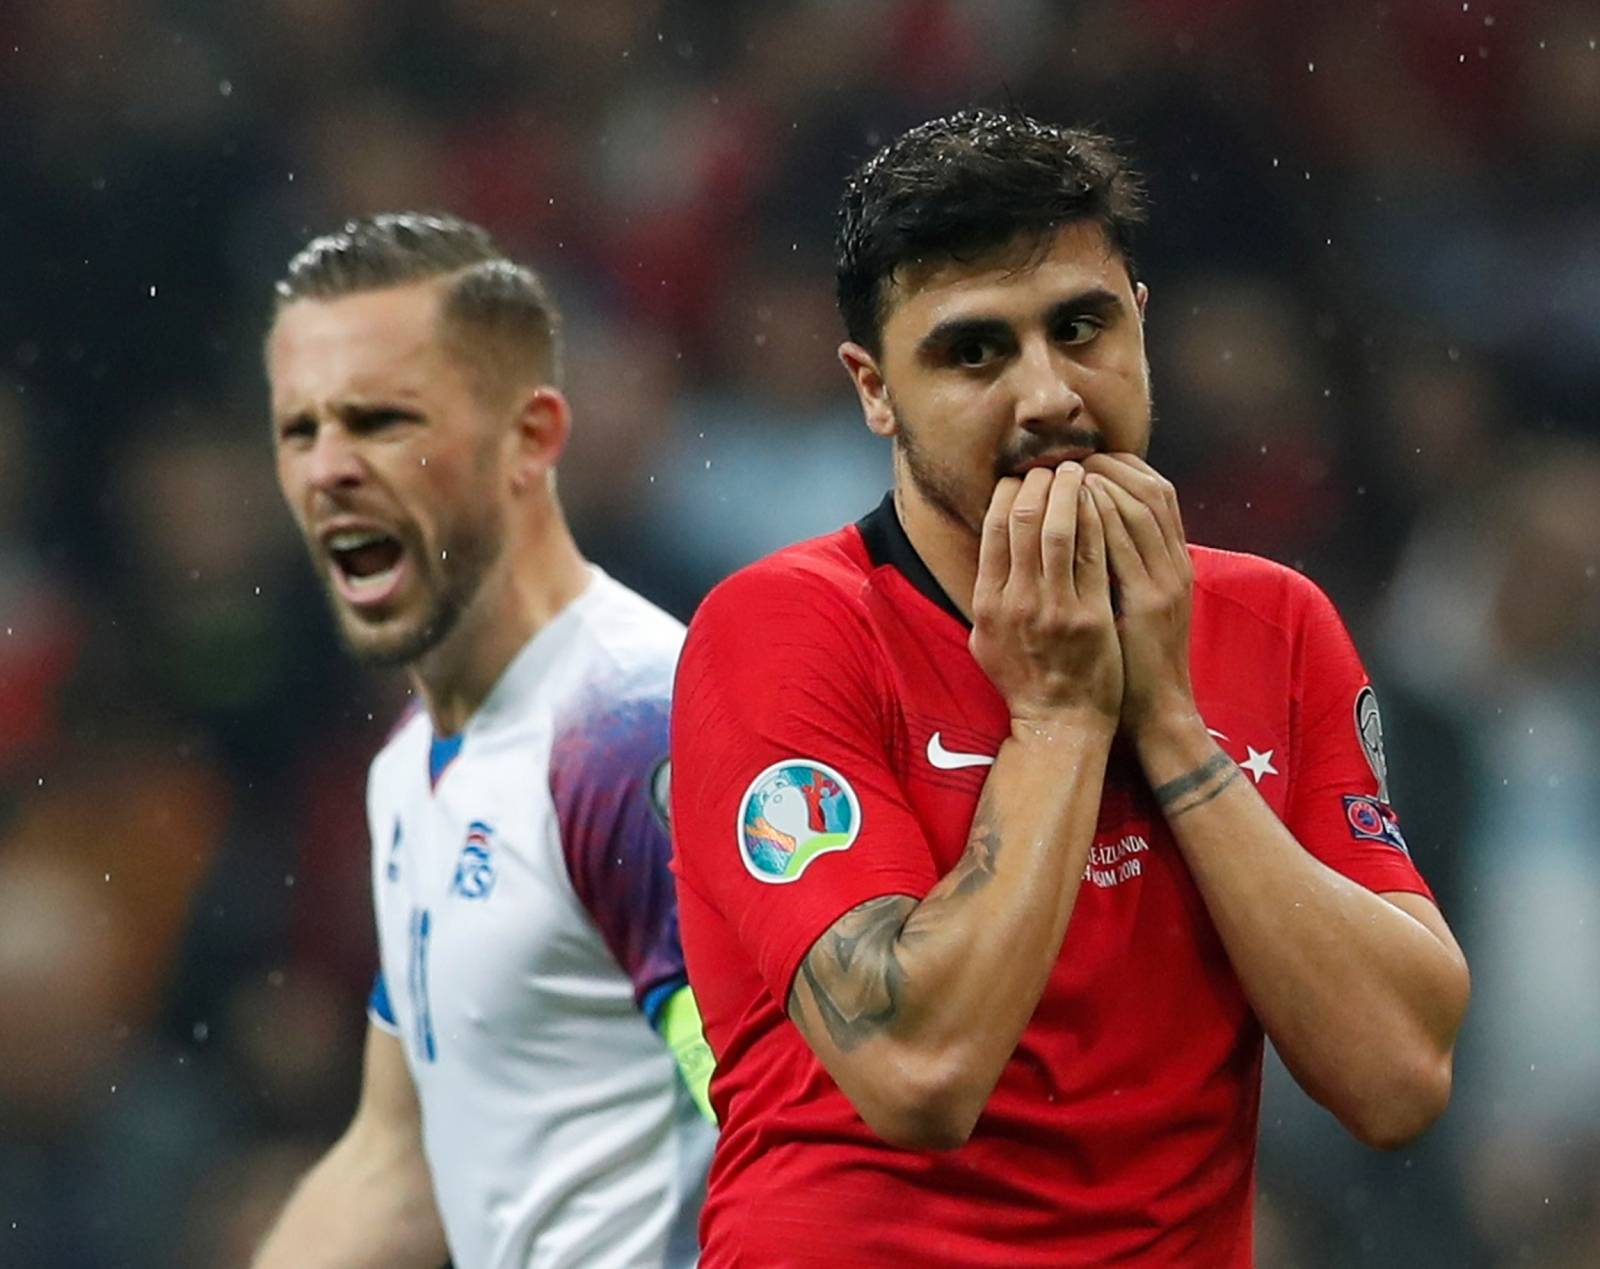 Euro 2020 Qualifier - Group H - Turkey v Iceland